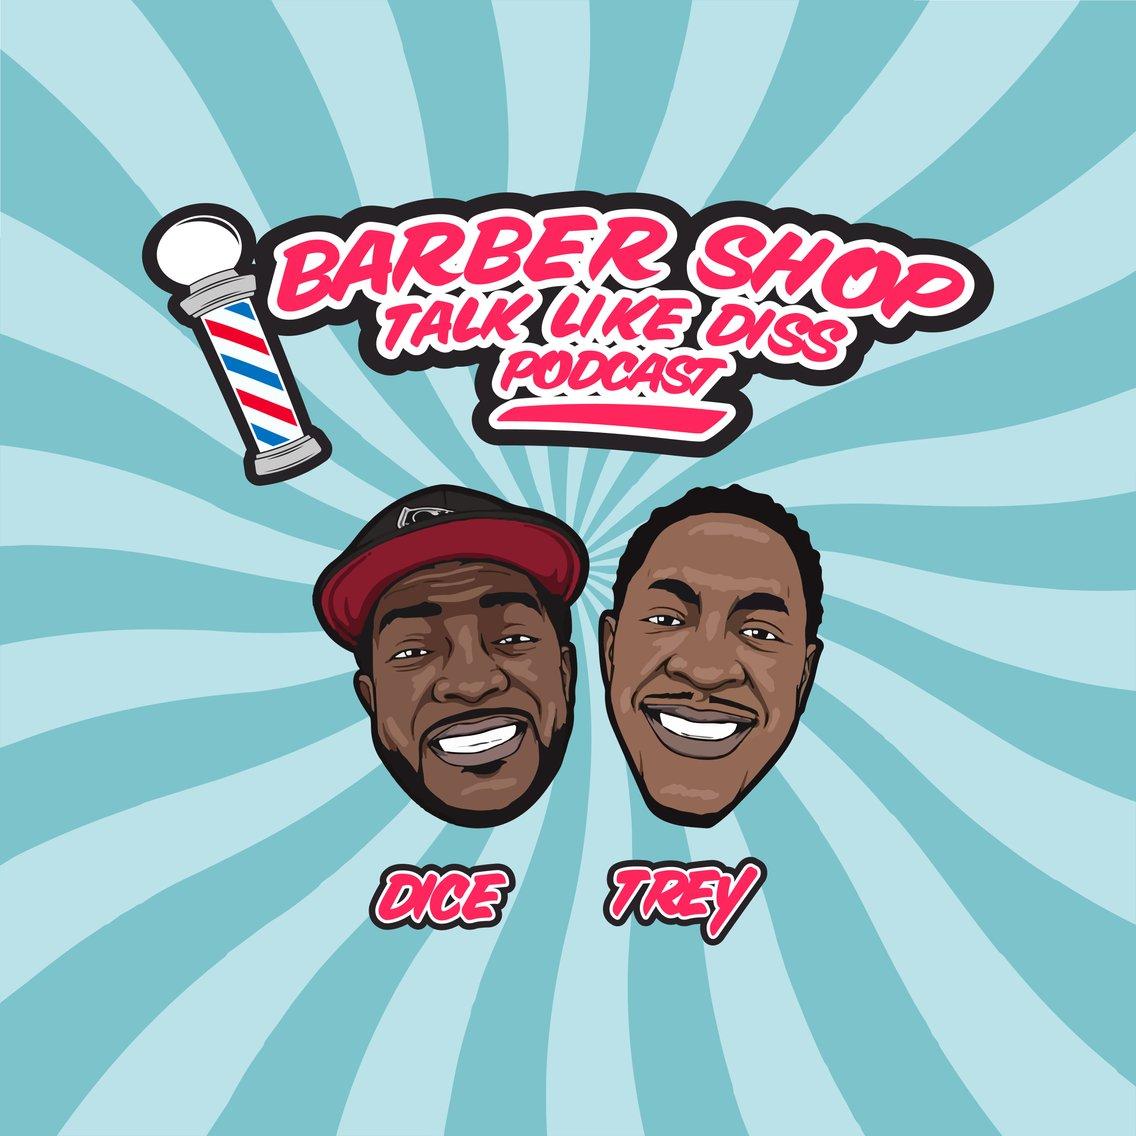 Barbershop Talk Like Diss - imagen de portada